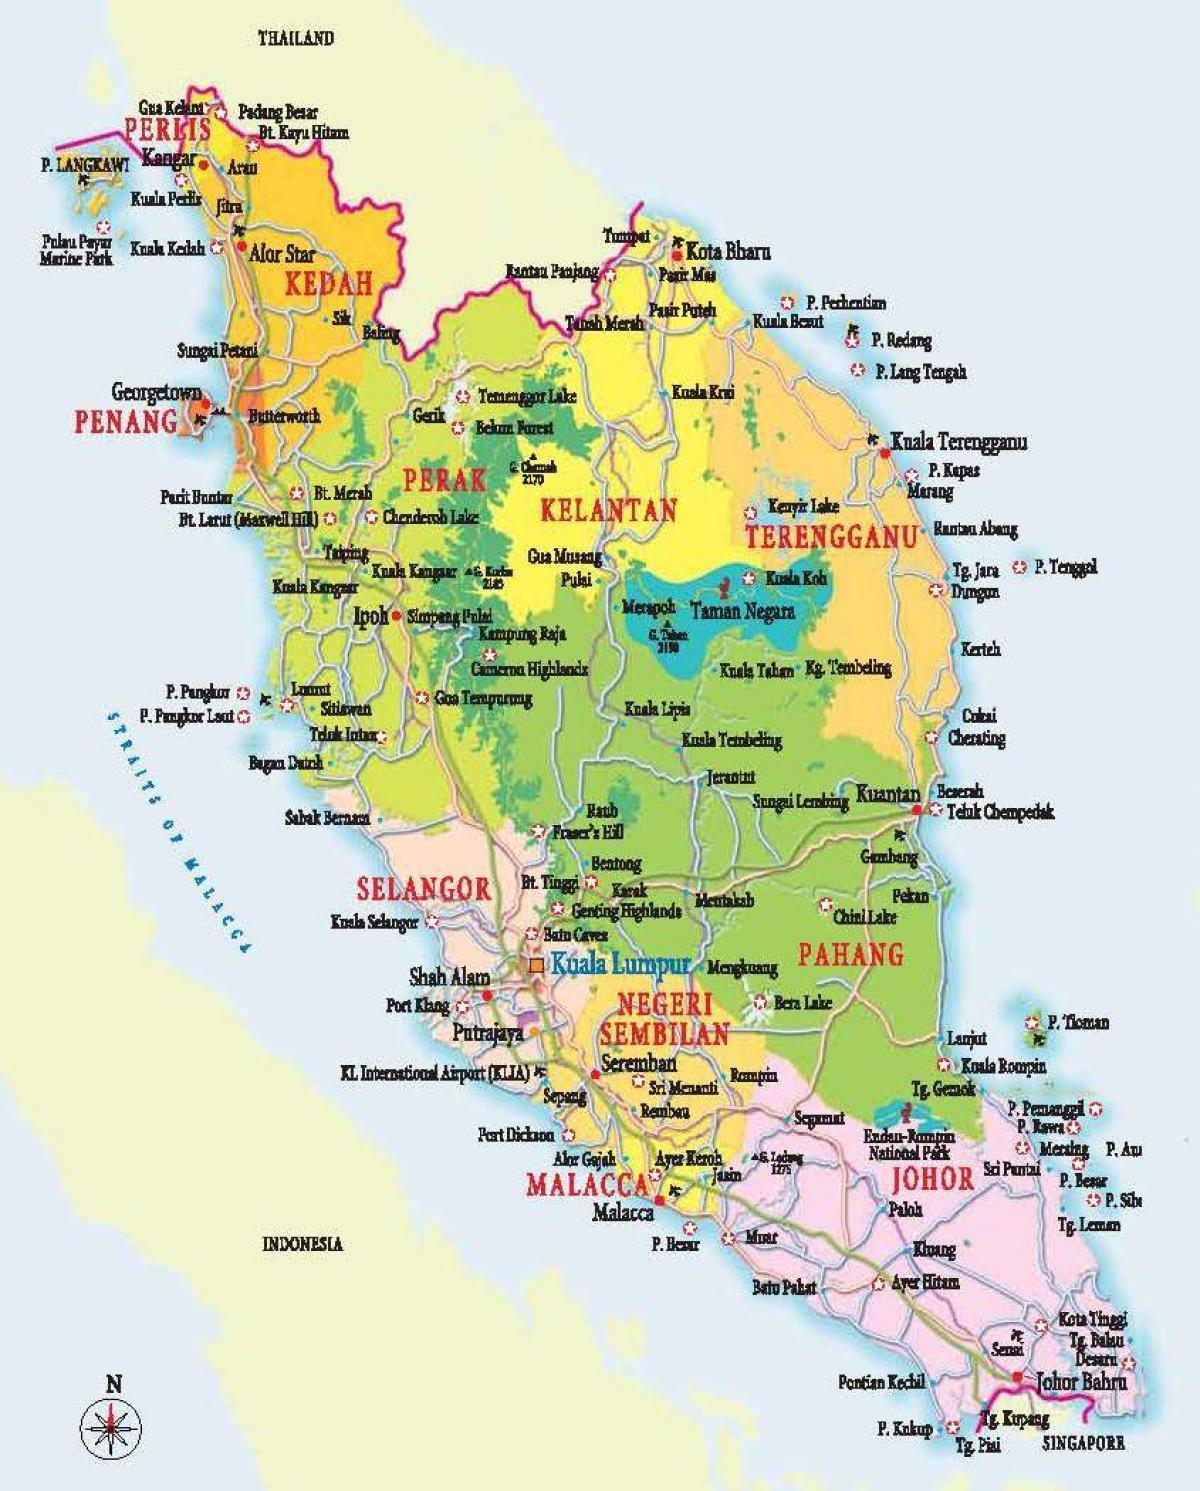 I Det Vestlige Malaysia Kort Kort Over Det Vestlige Malaysia